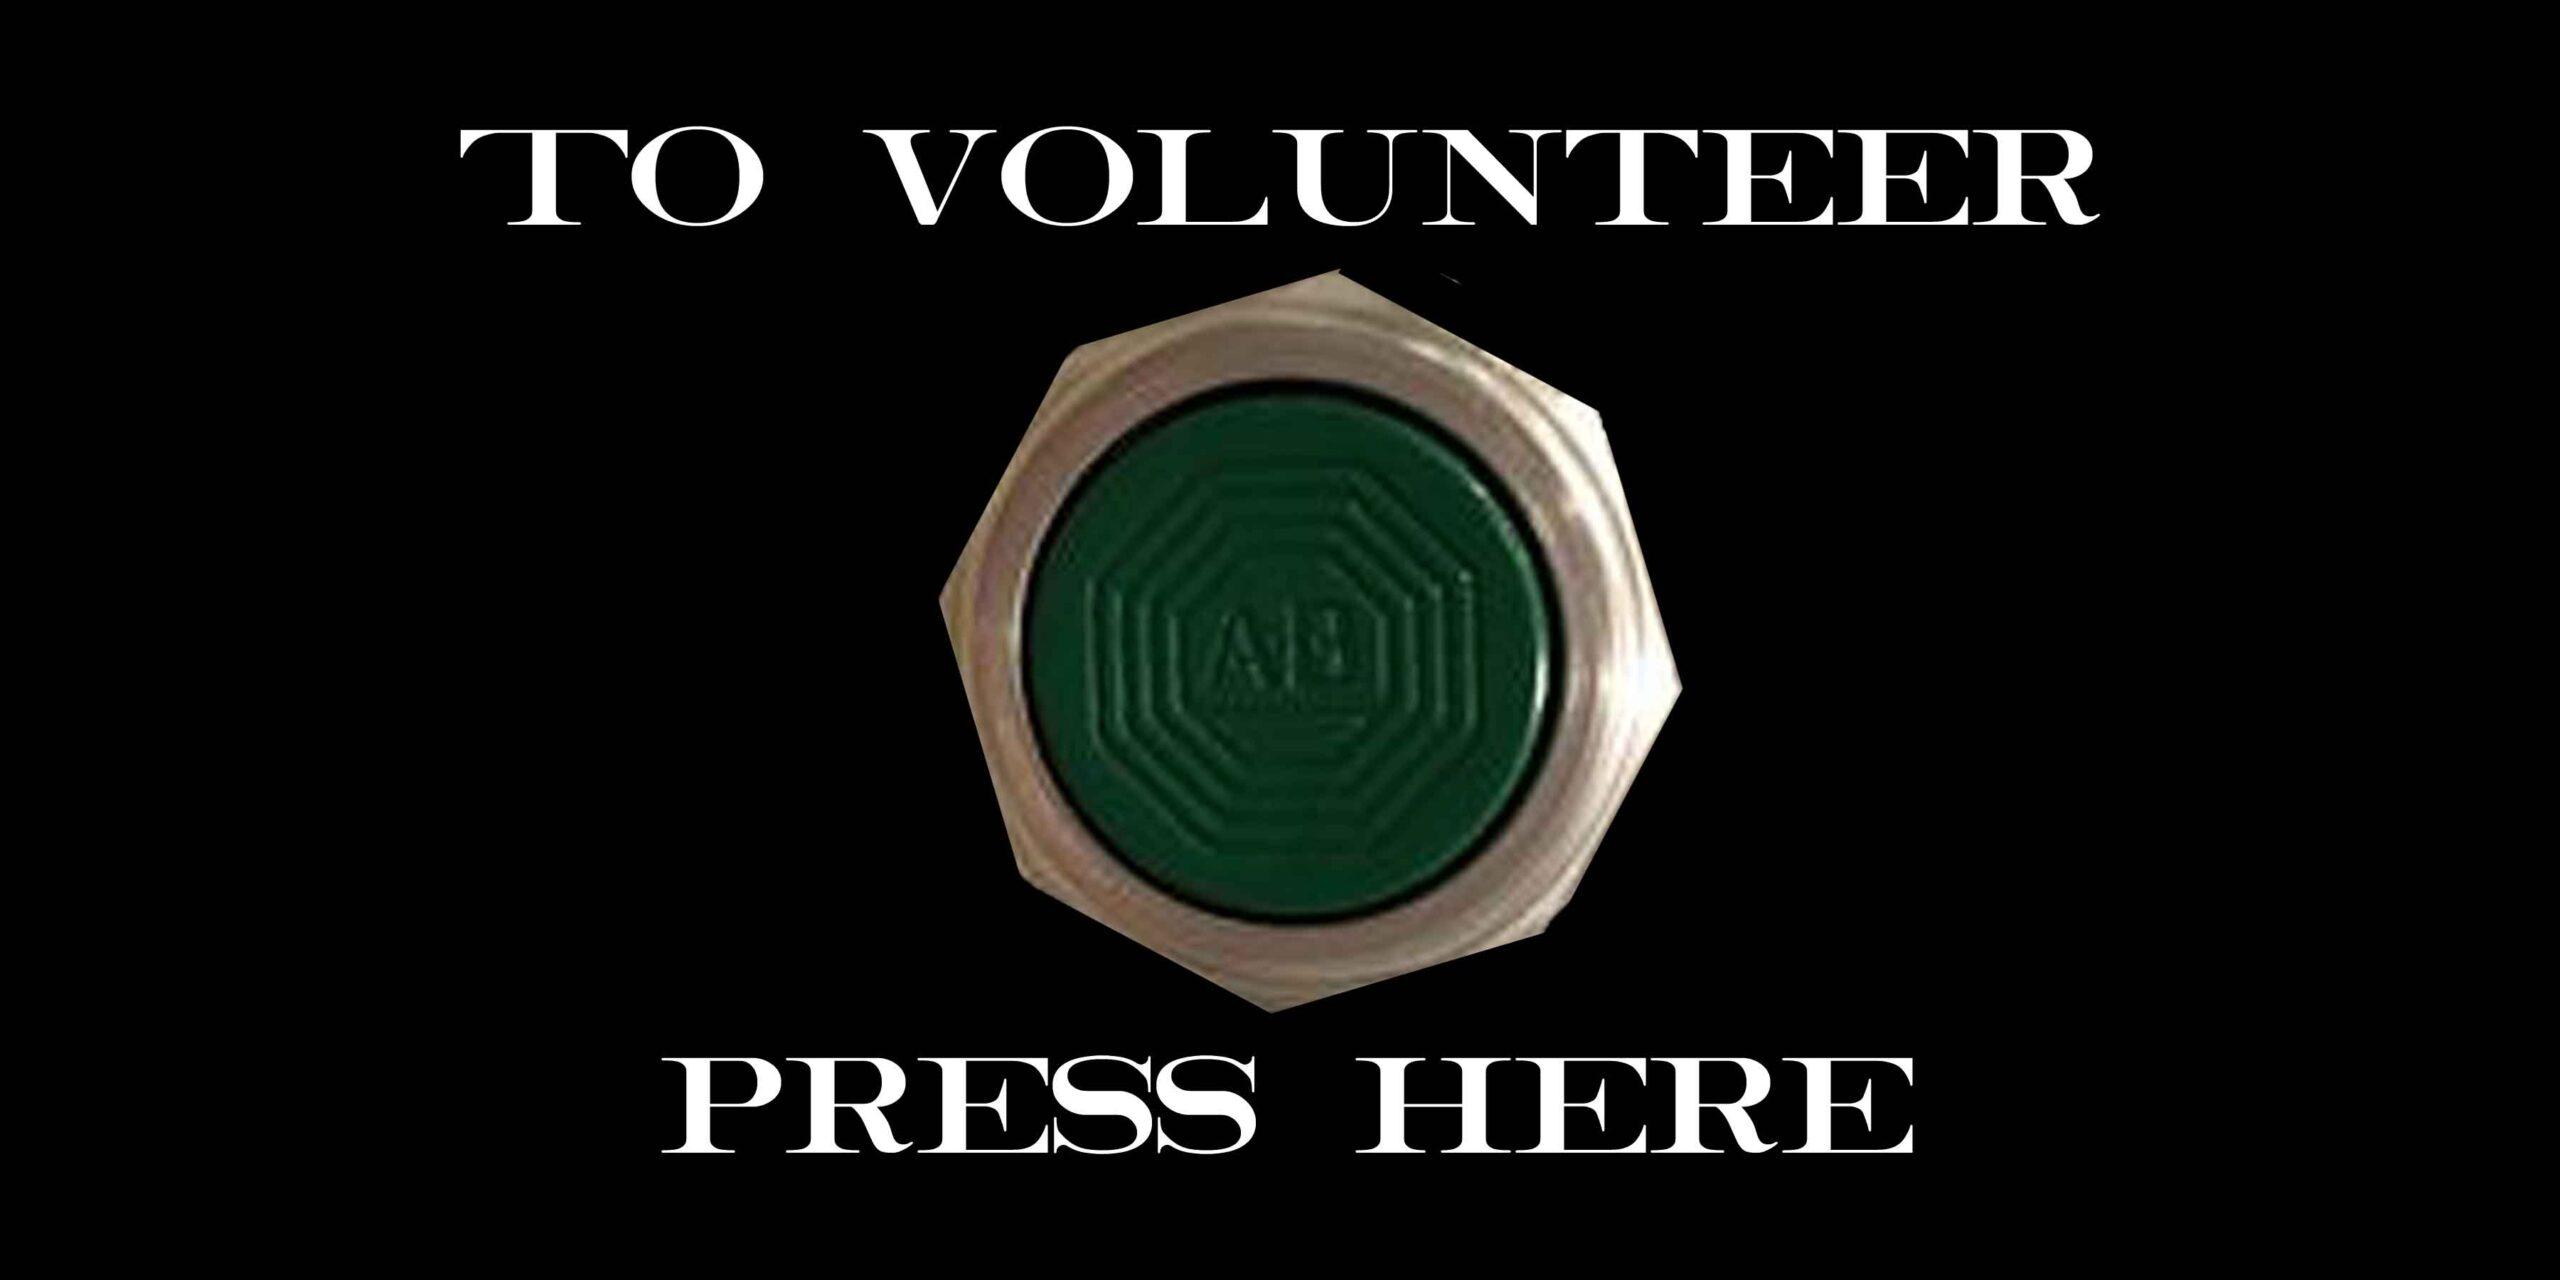 http://mzq.1be.myftpupload.com/volunteer/